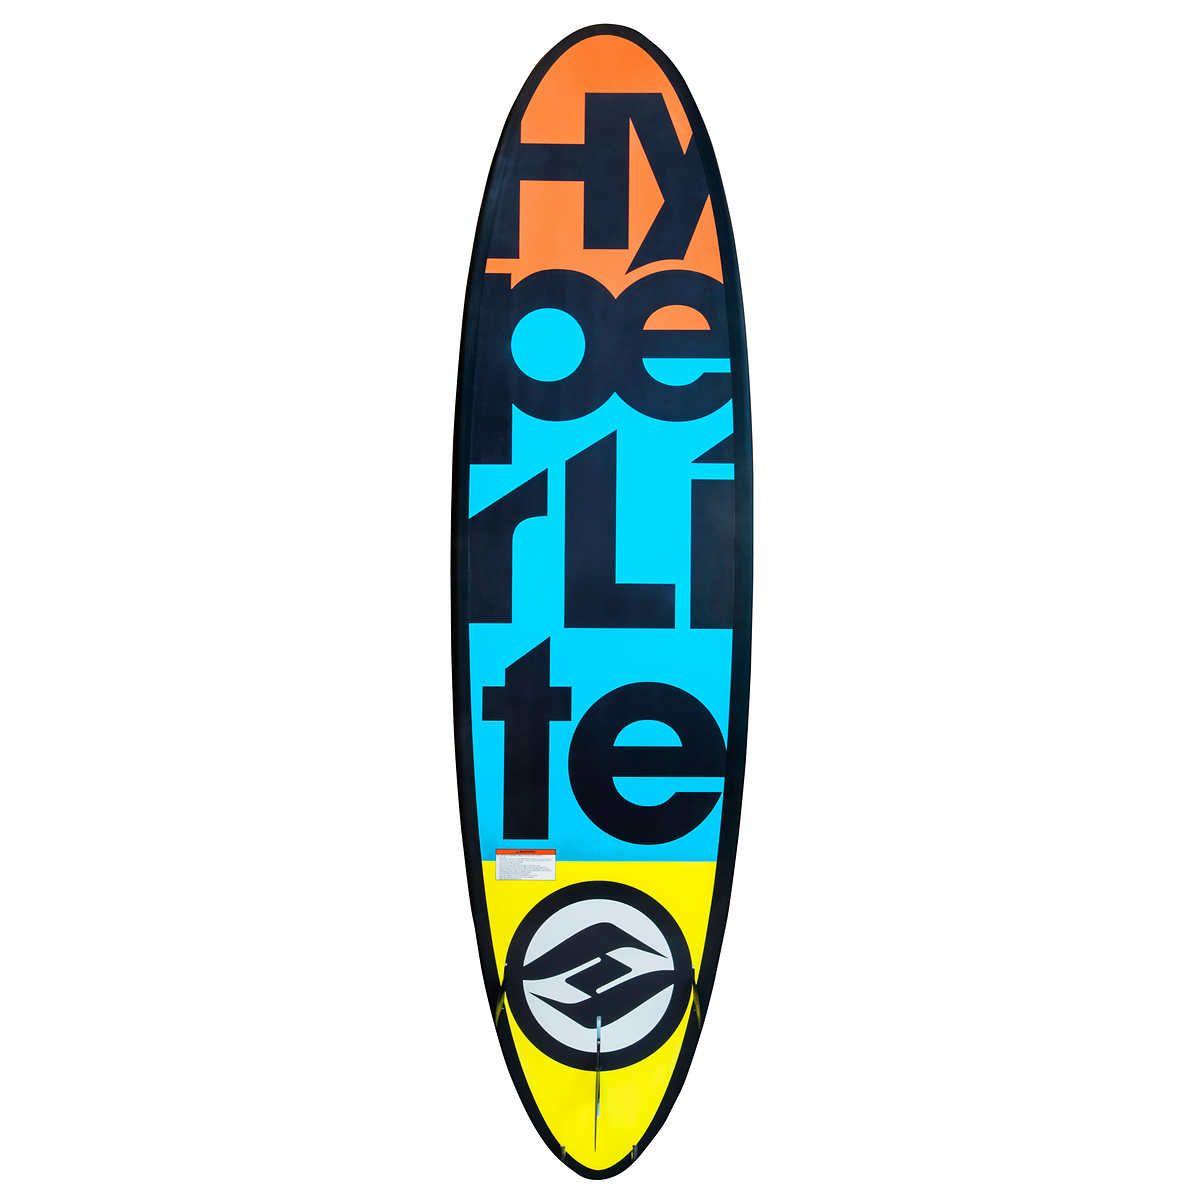 Hyperlite Alki 11 Stand Up Paddleboard Standup Paddle Board Paddleboarding Quotes Paddle Boarding